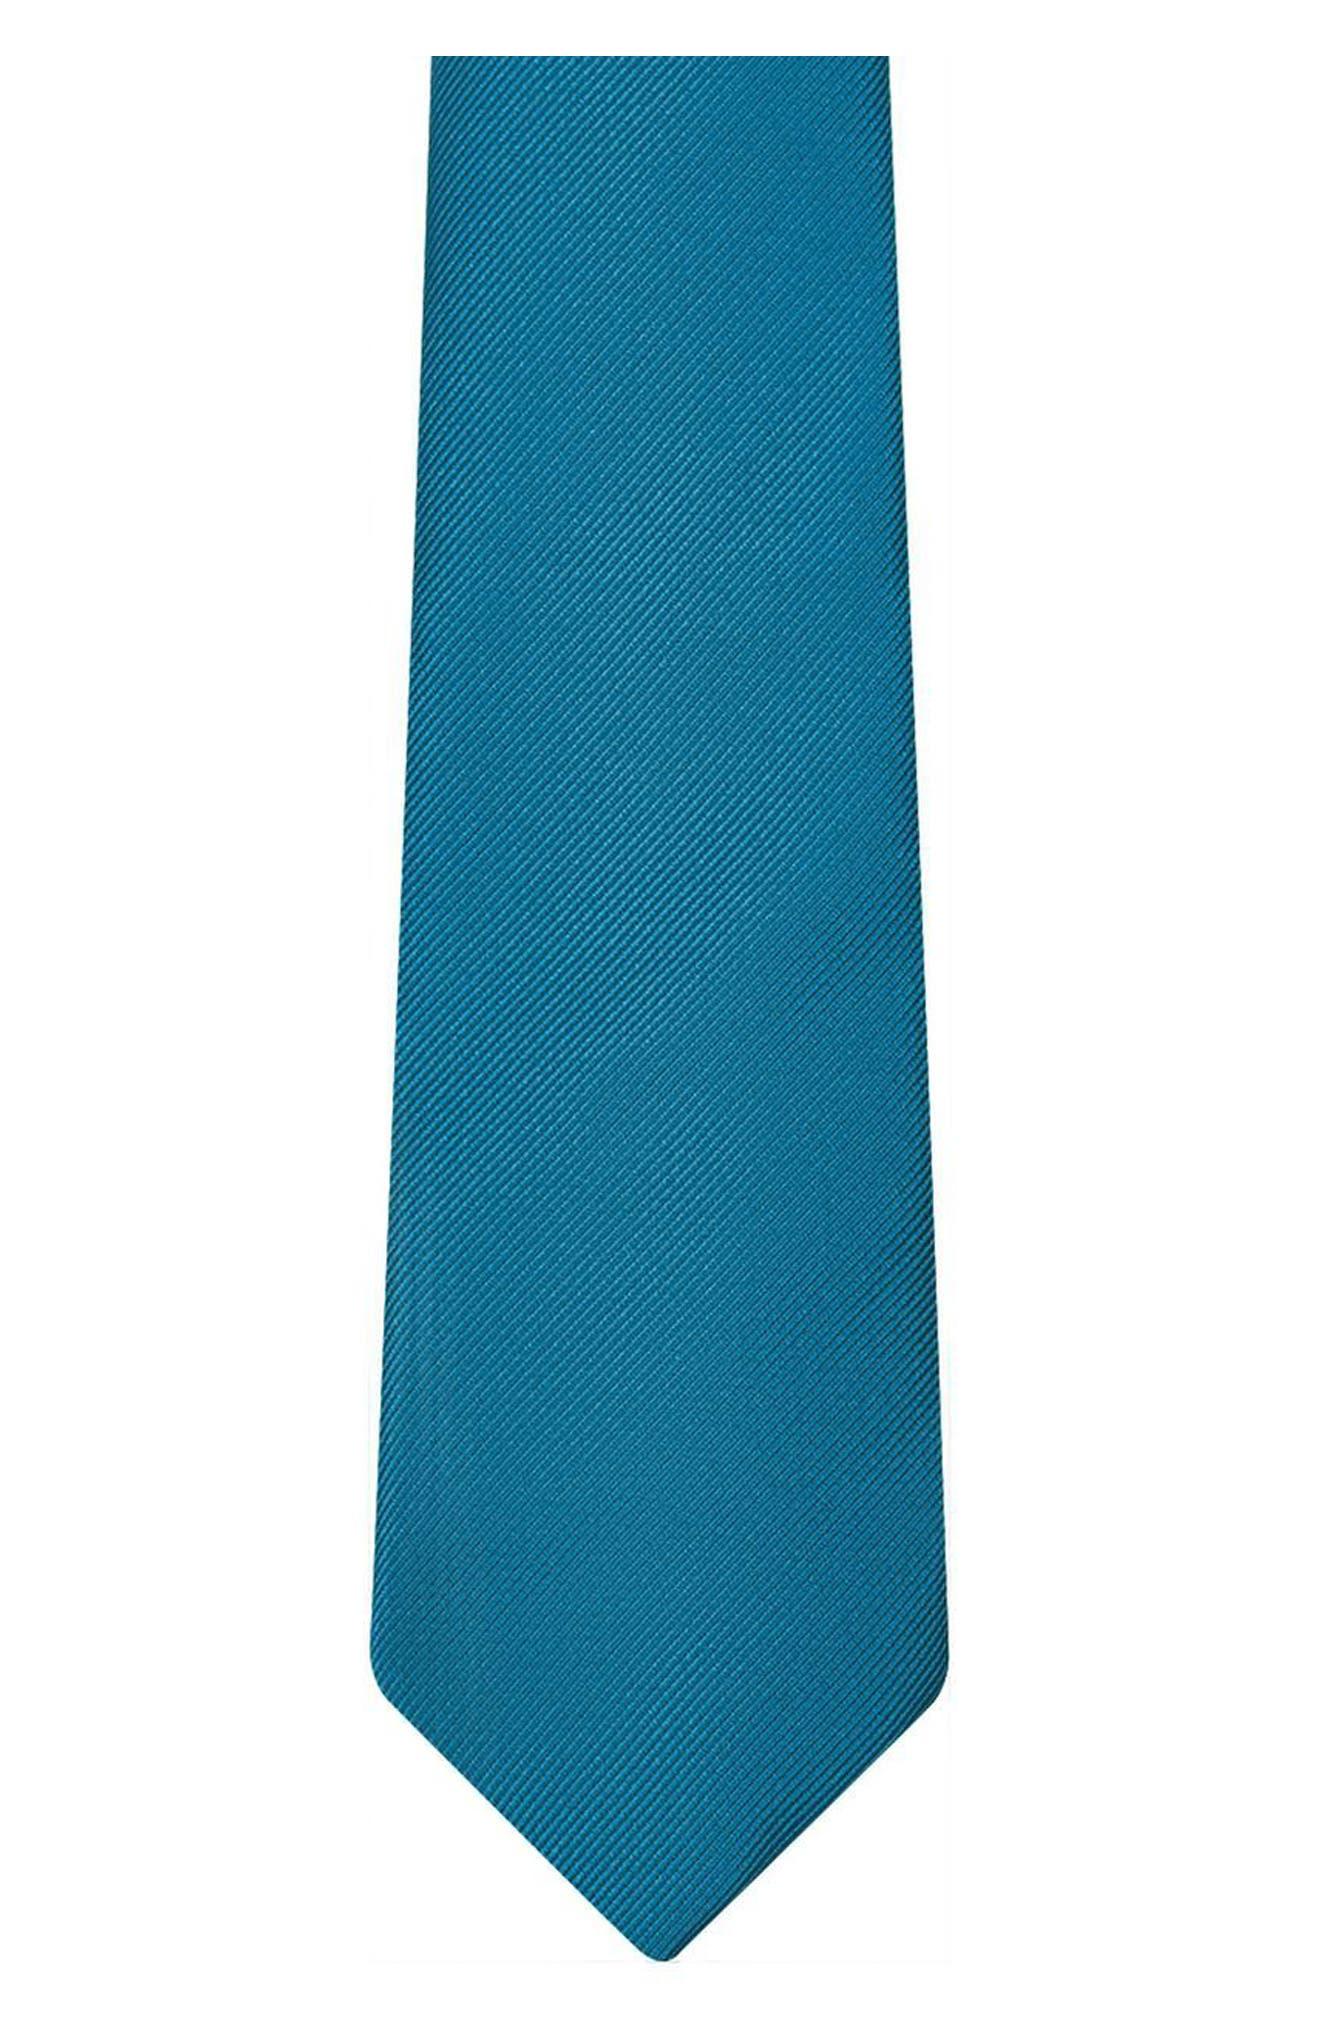 Woven Tie,                             Alternate thumbnail 2, color,                             440